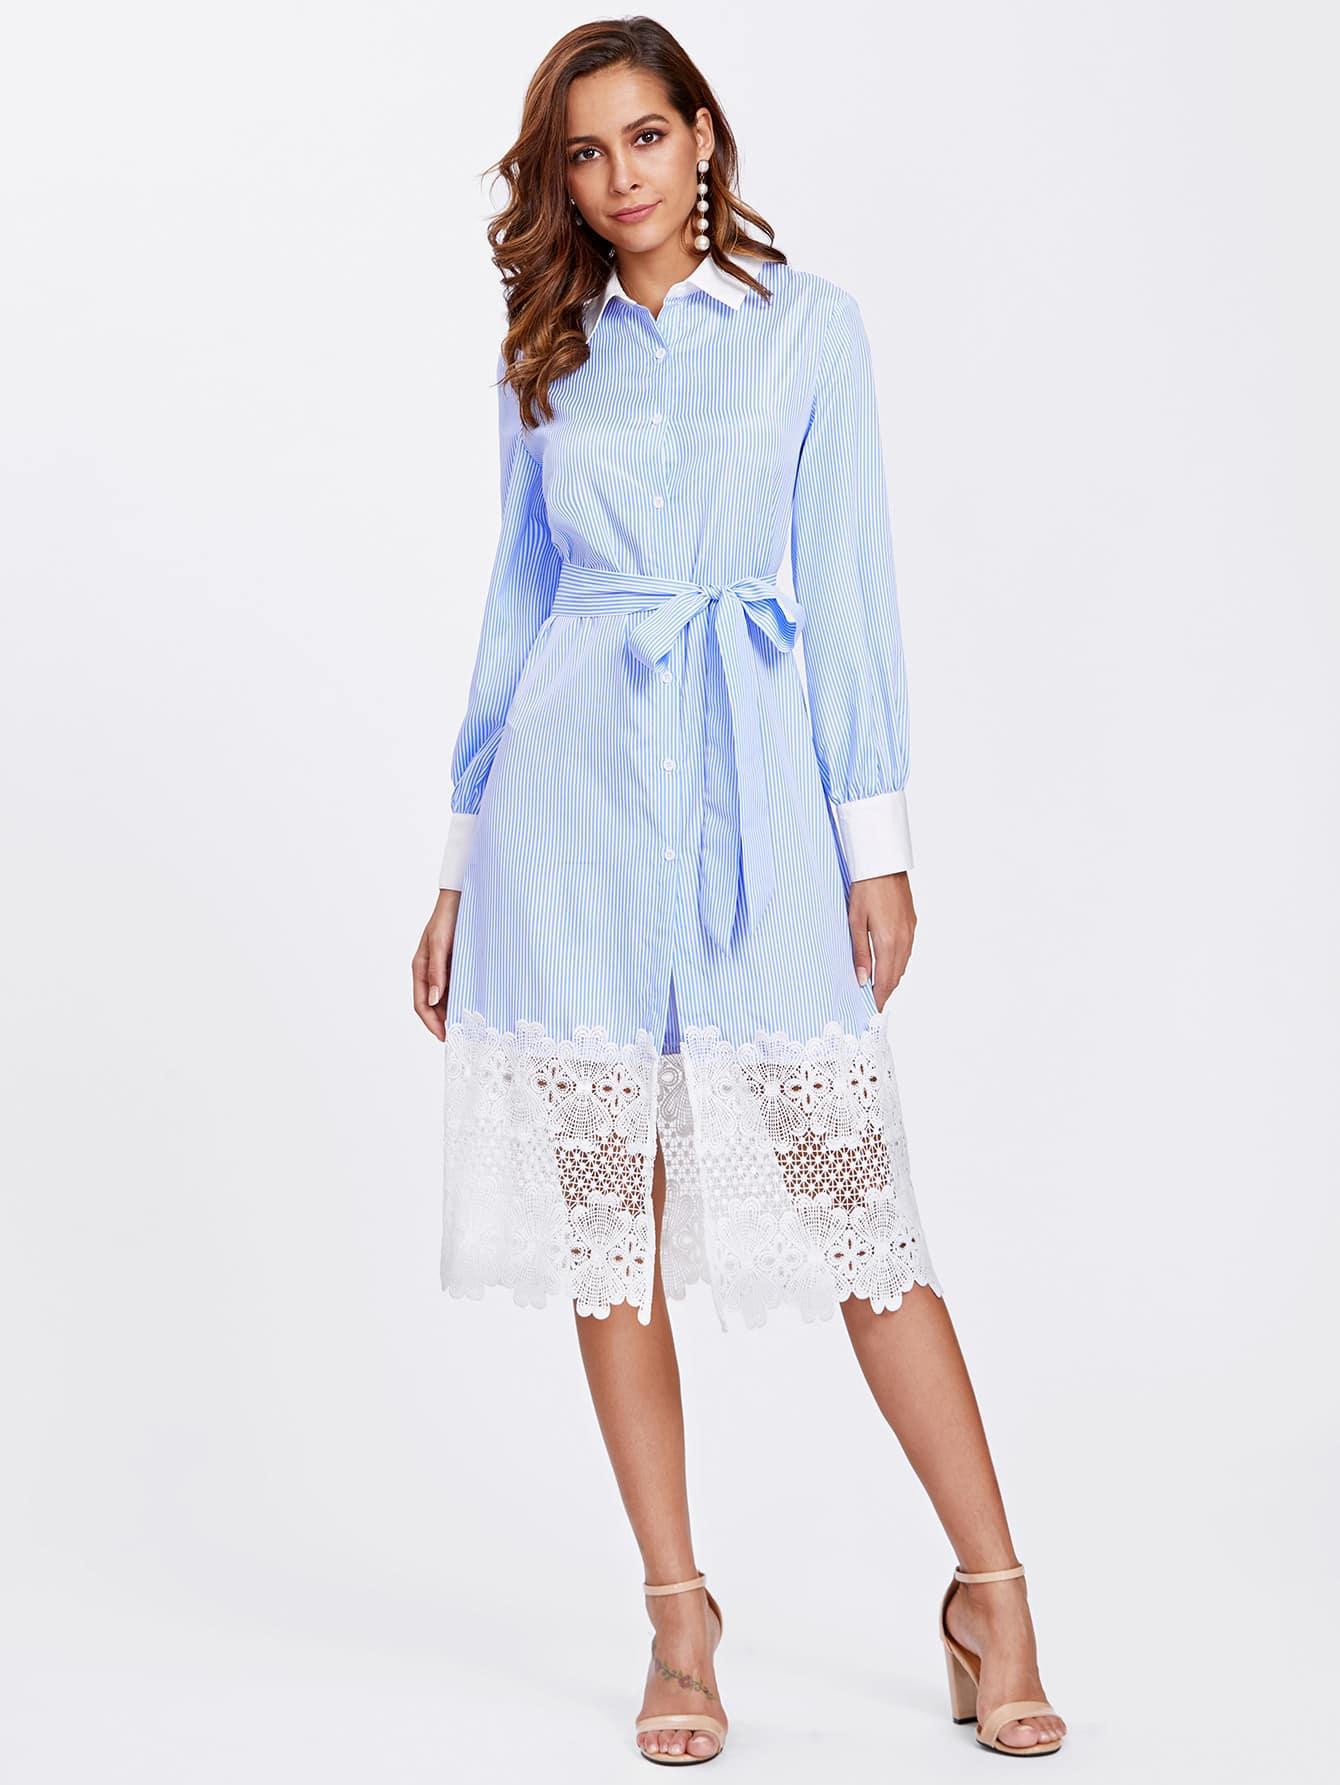 Contrast Trim Lace Hem Pinstripe Shirt Dress maison jules new junior s small s pink combo lace crepe contrast trim dress $89